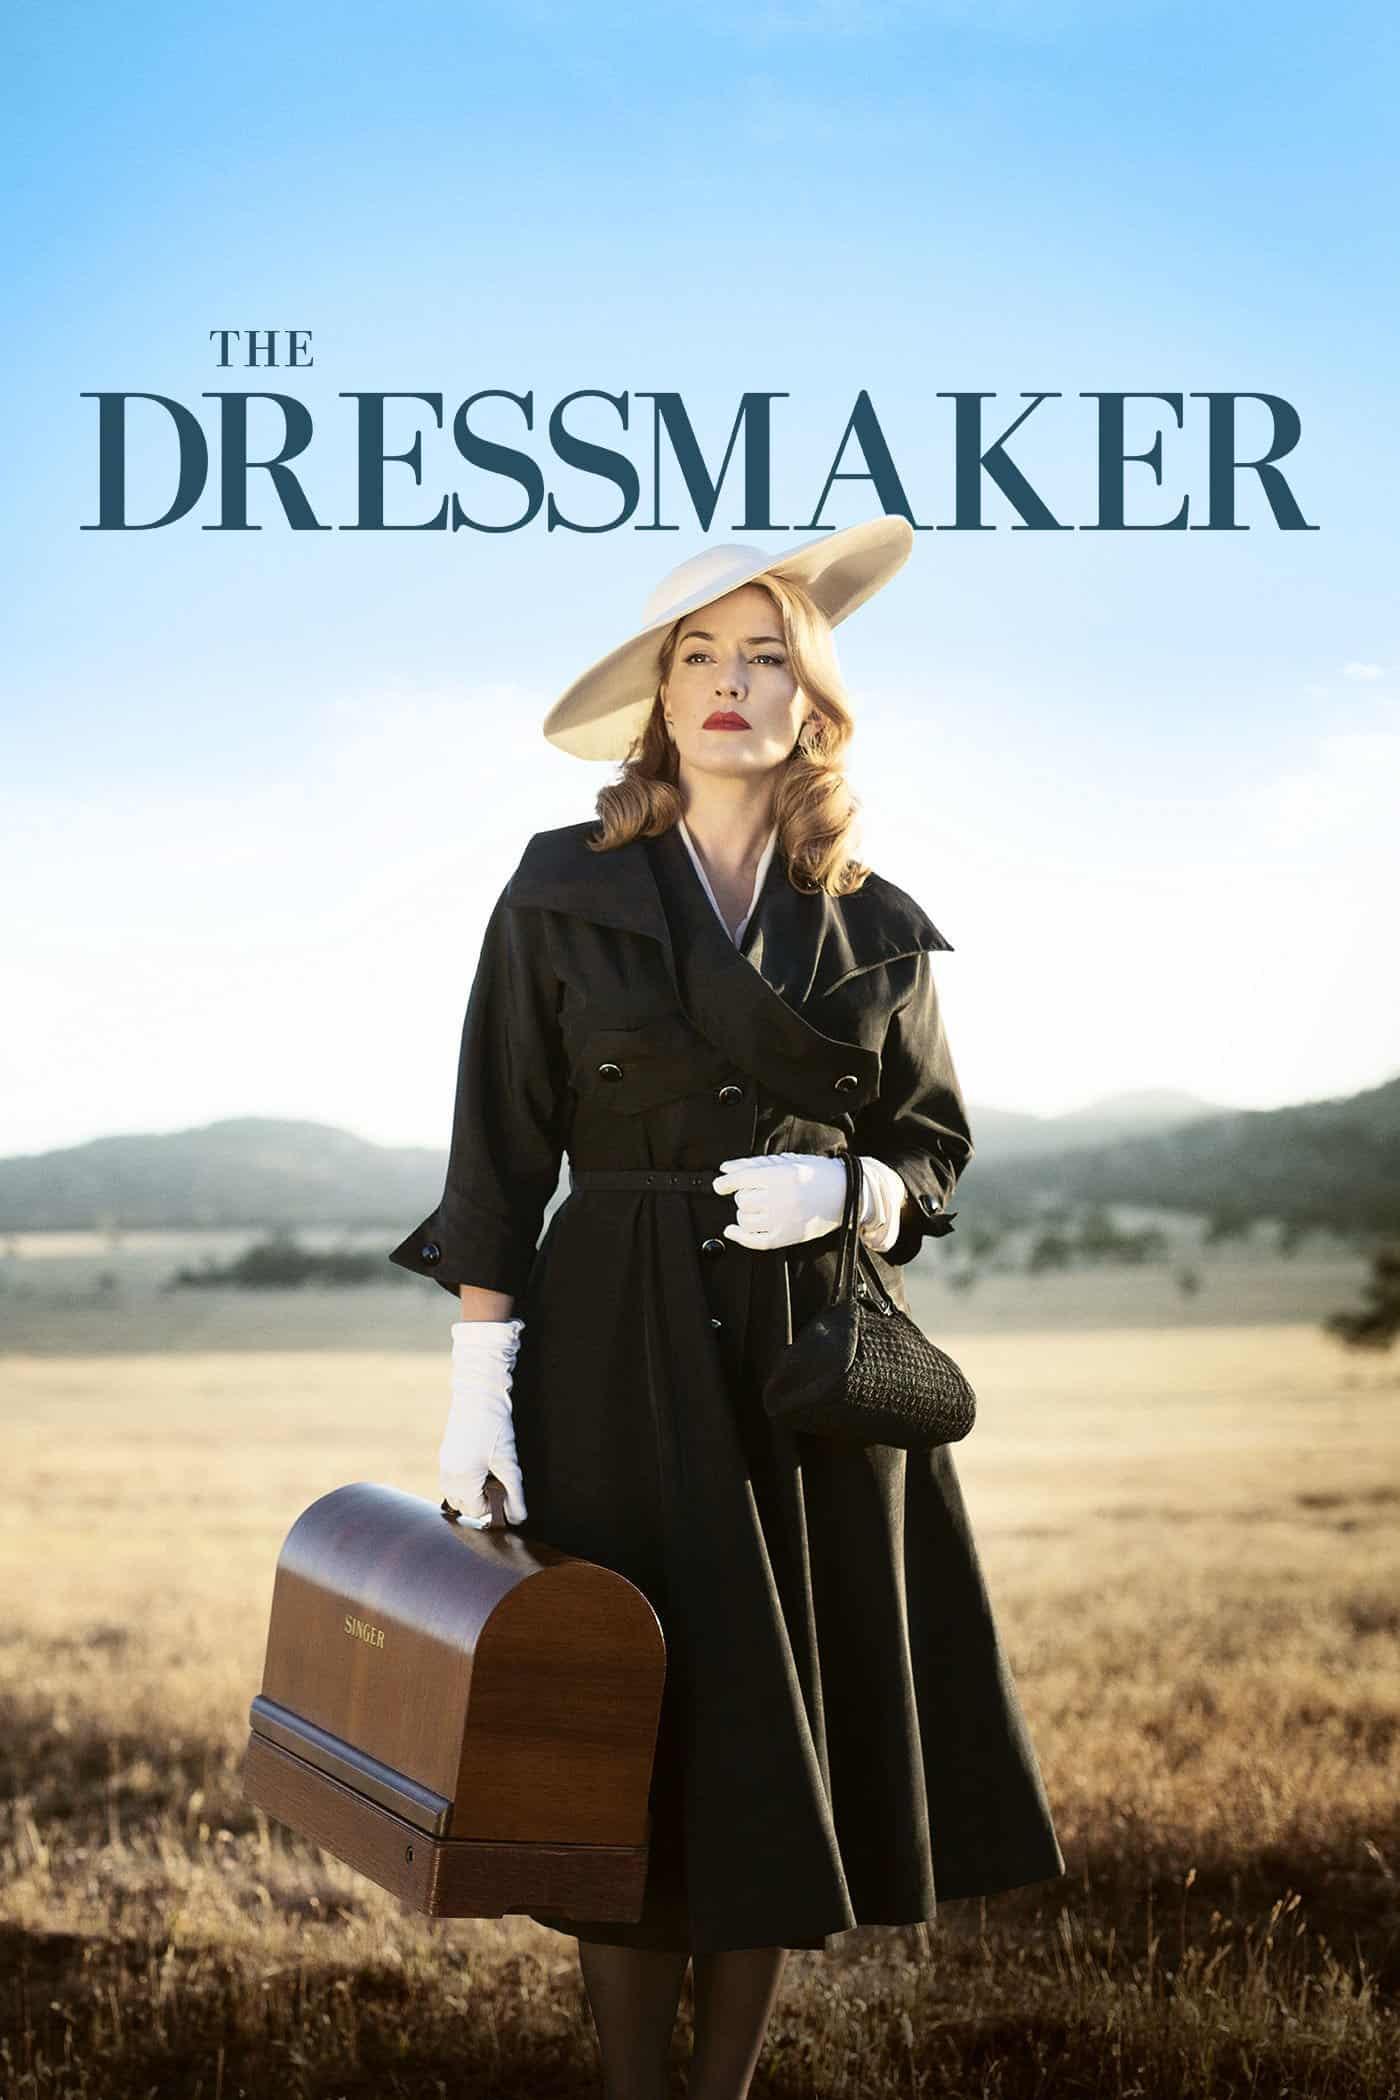 The Dressmaker, 2015